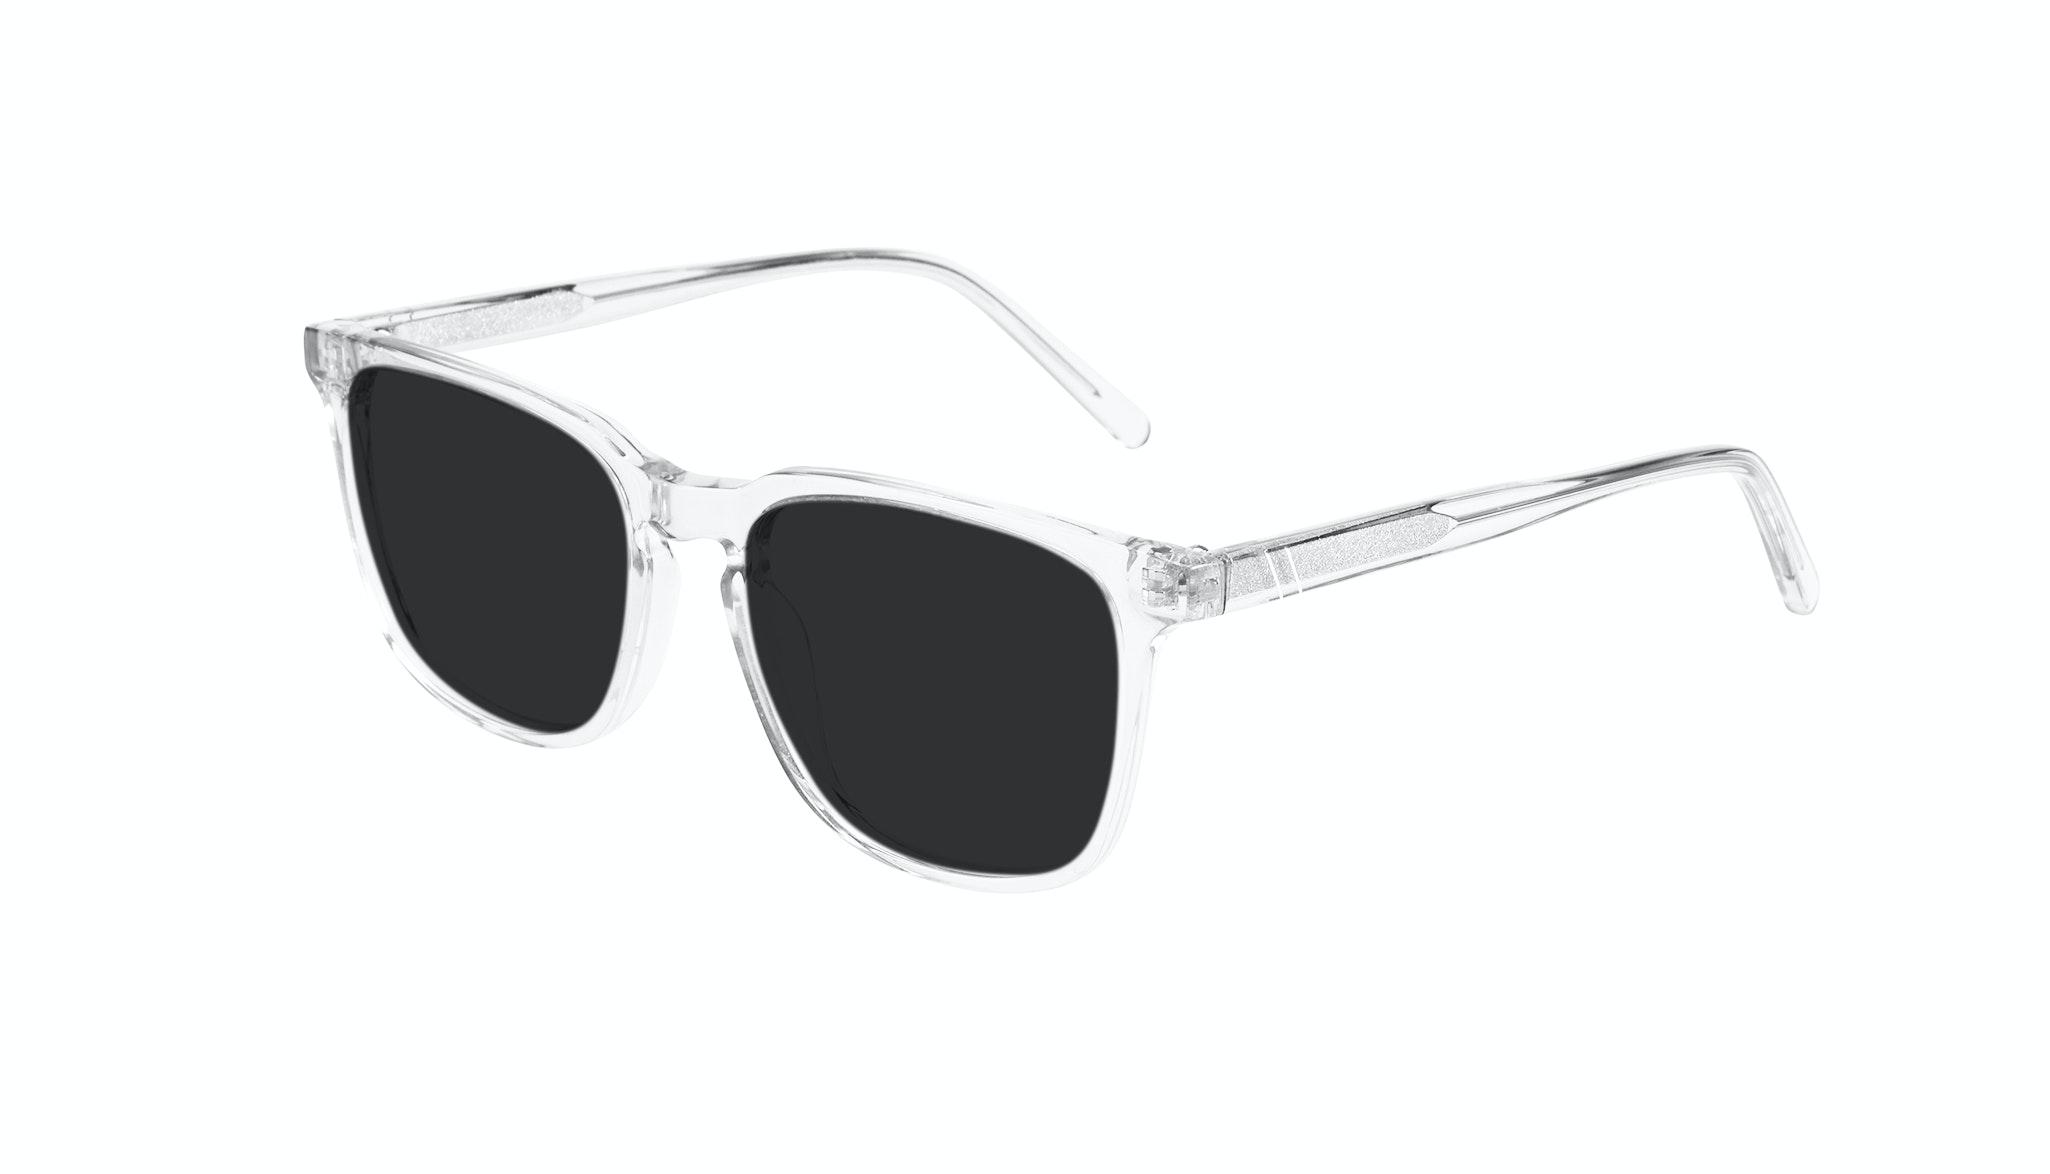 Affordable Fashion Glasses Rectangle Sunglasses Men Trace grey Tilt